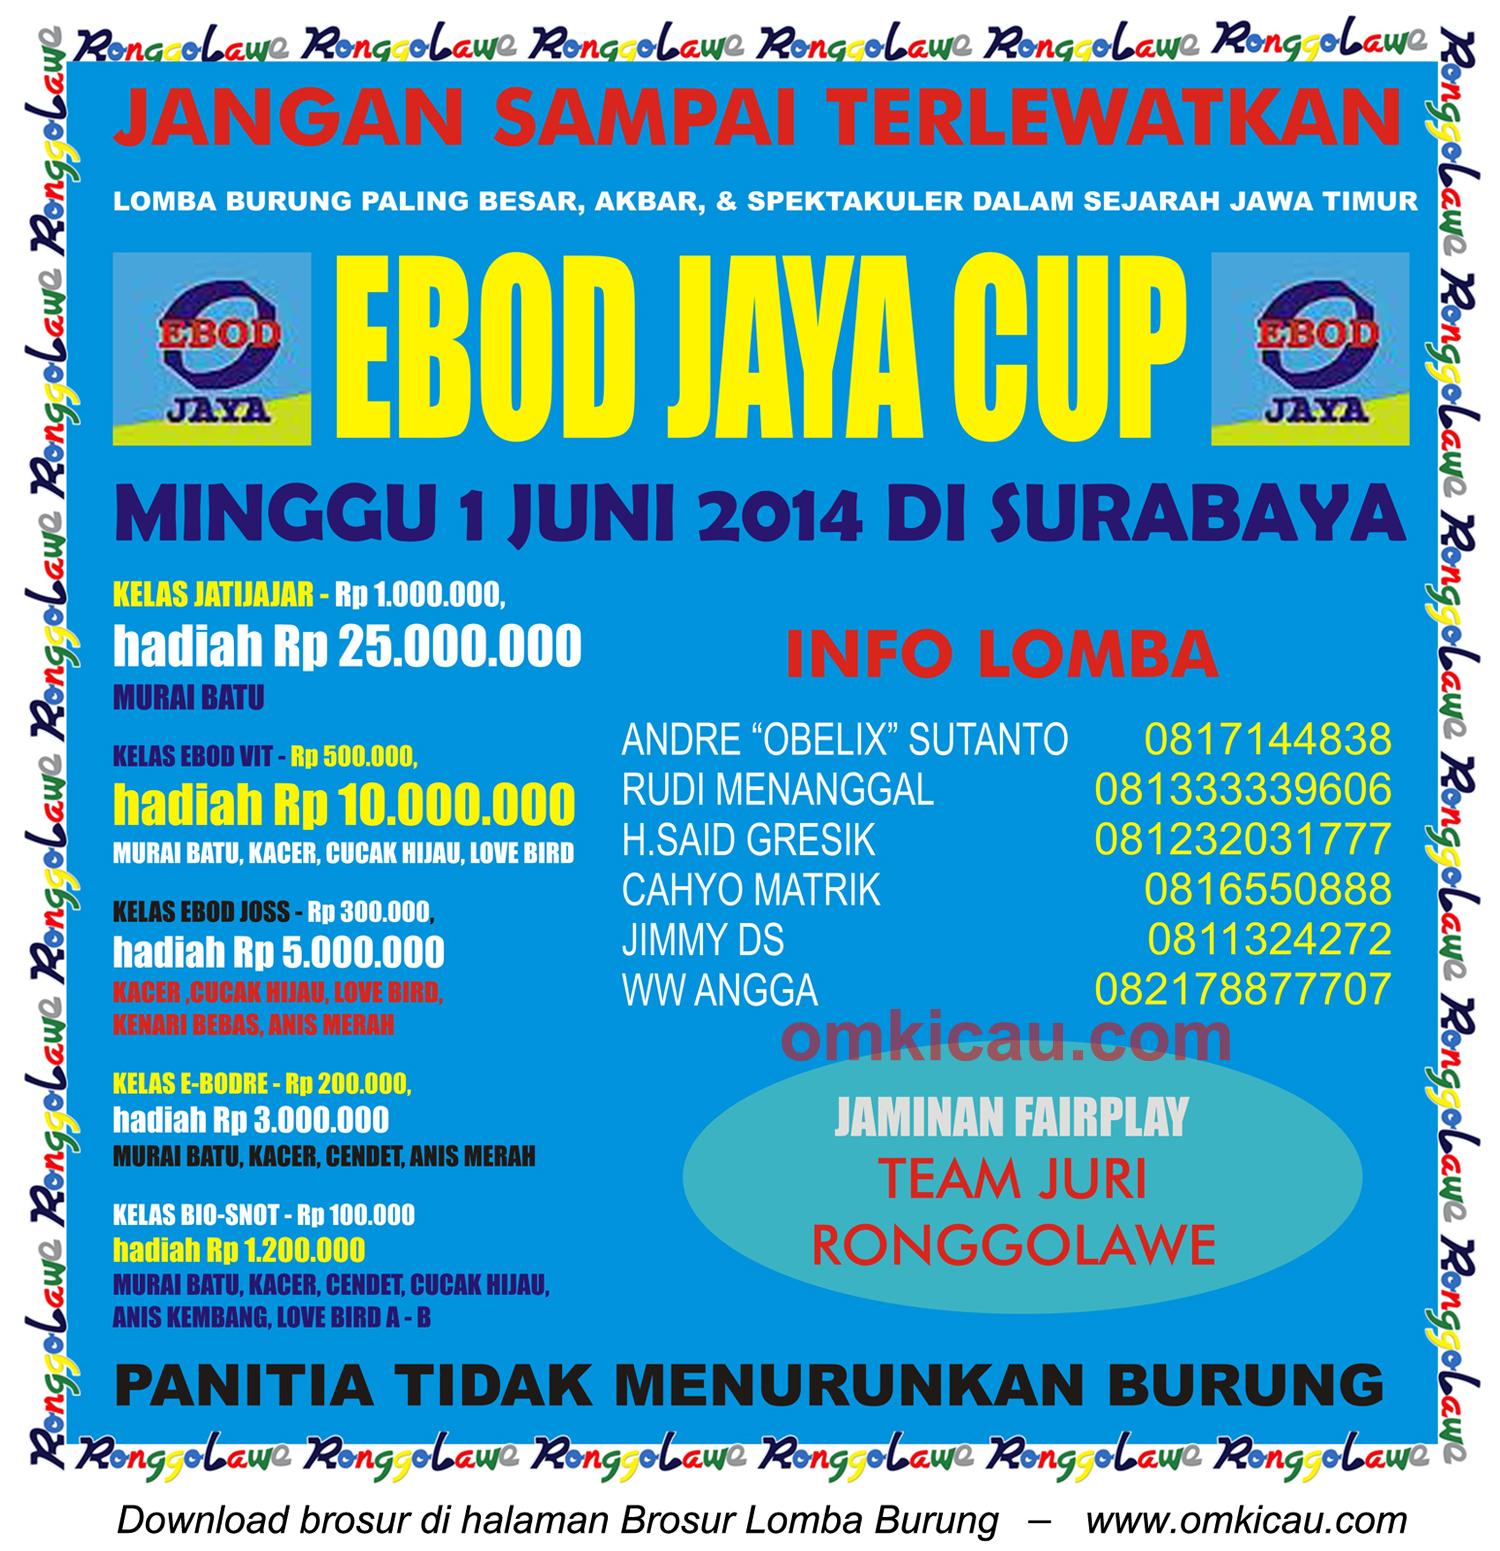 Brosur Lomba Burung Berkicau Ebod Jaya Cup, Surabaya, 1 Juni 2014